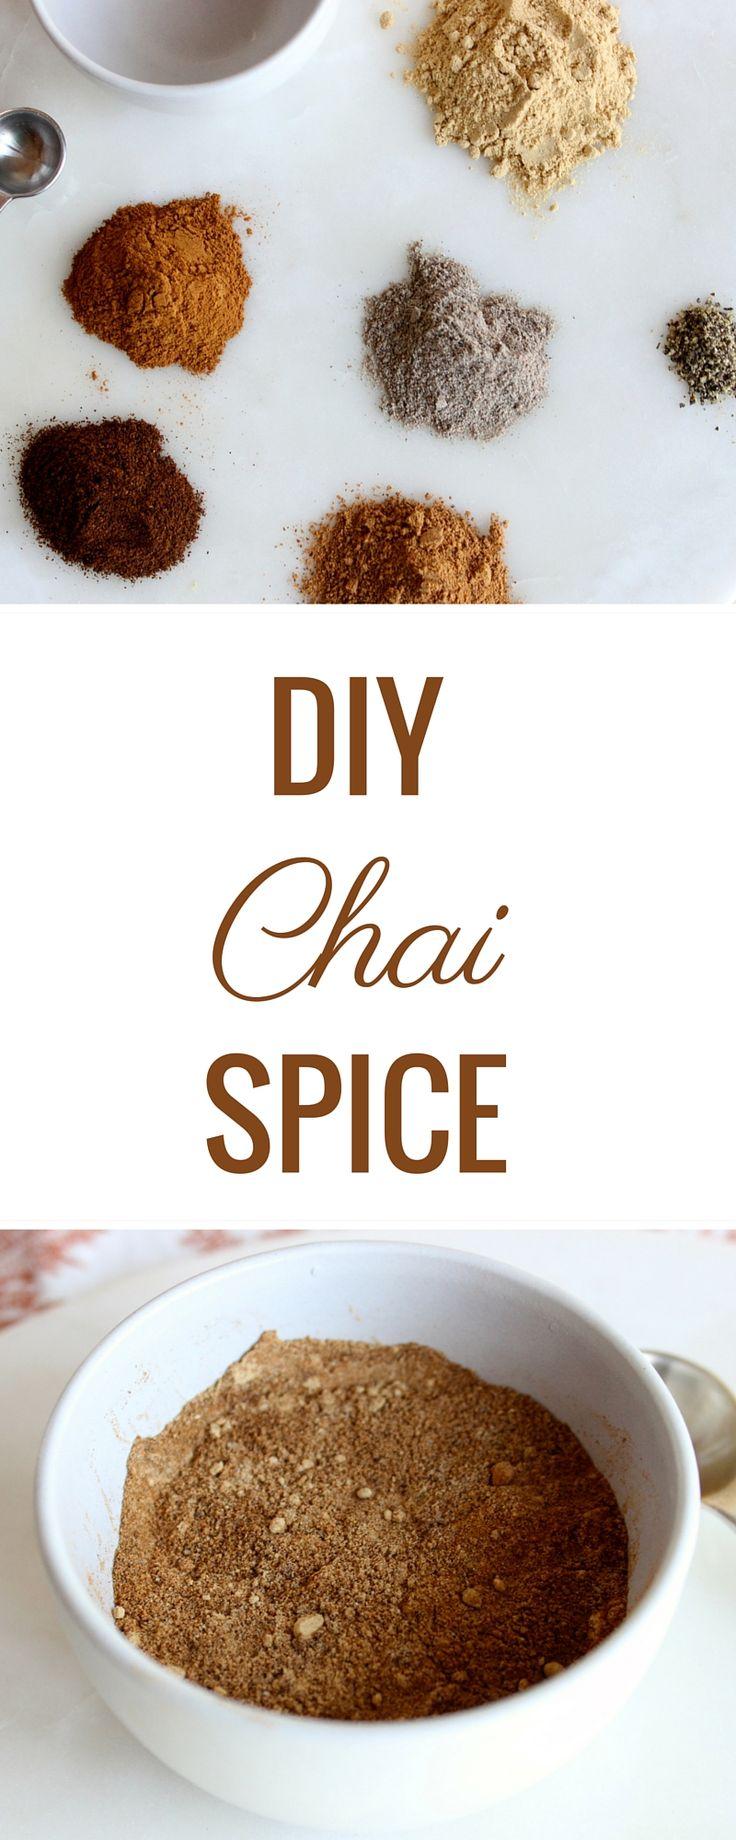 Easy DIY Chai spice blend is perfect to make lattes, oatmeal, yogurt, and more taste like chai!